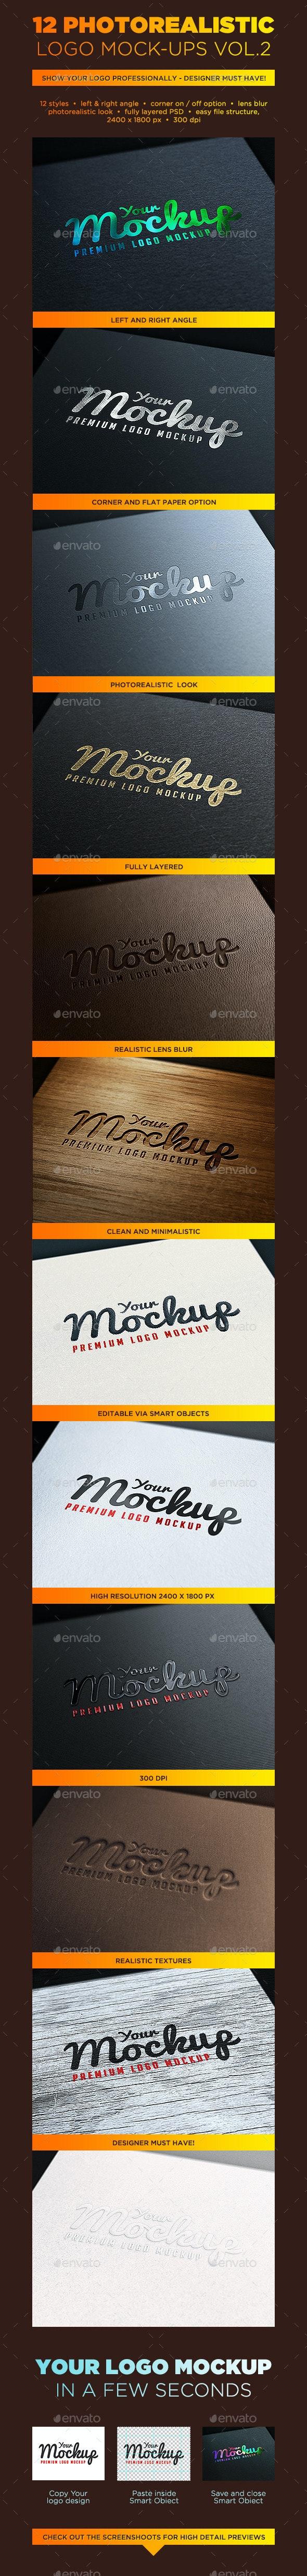 Your Mockup - Logo Mockups VOL.2 - Logo Product Mock-Ups